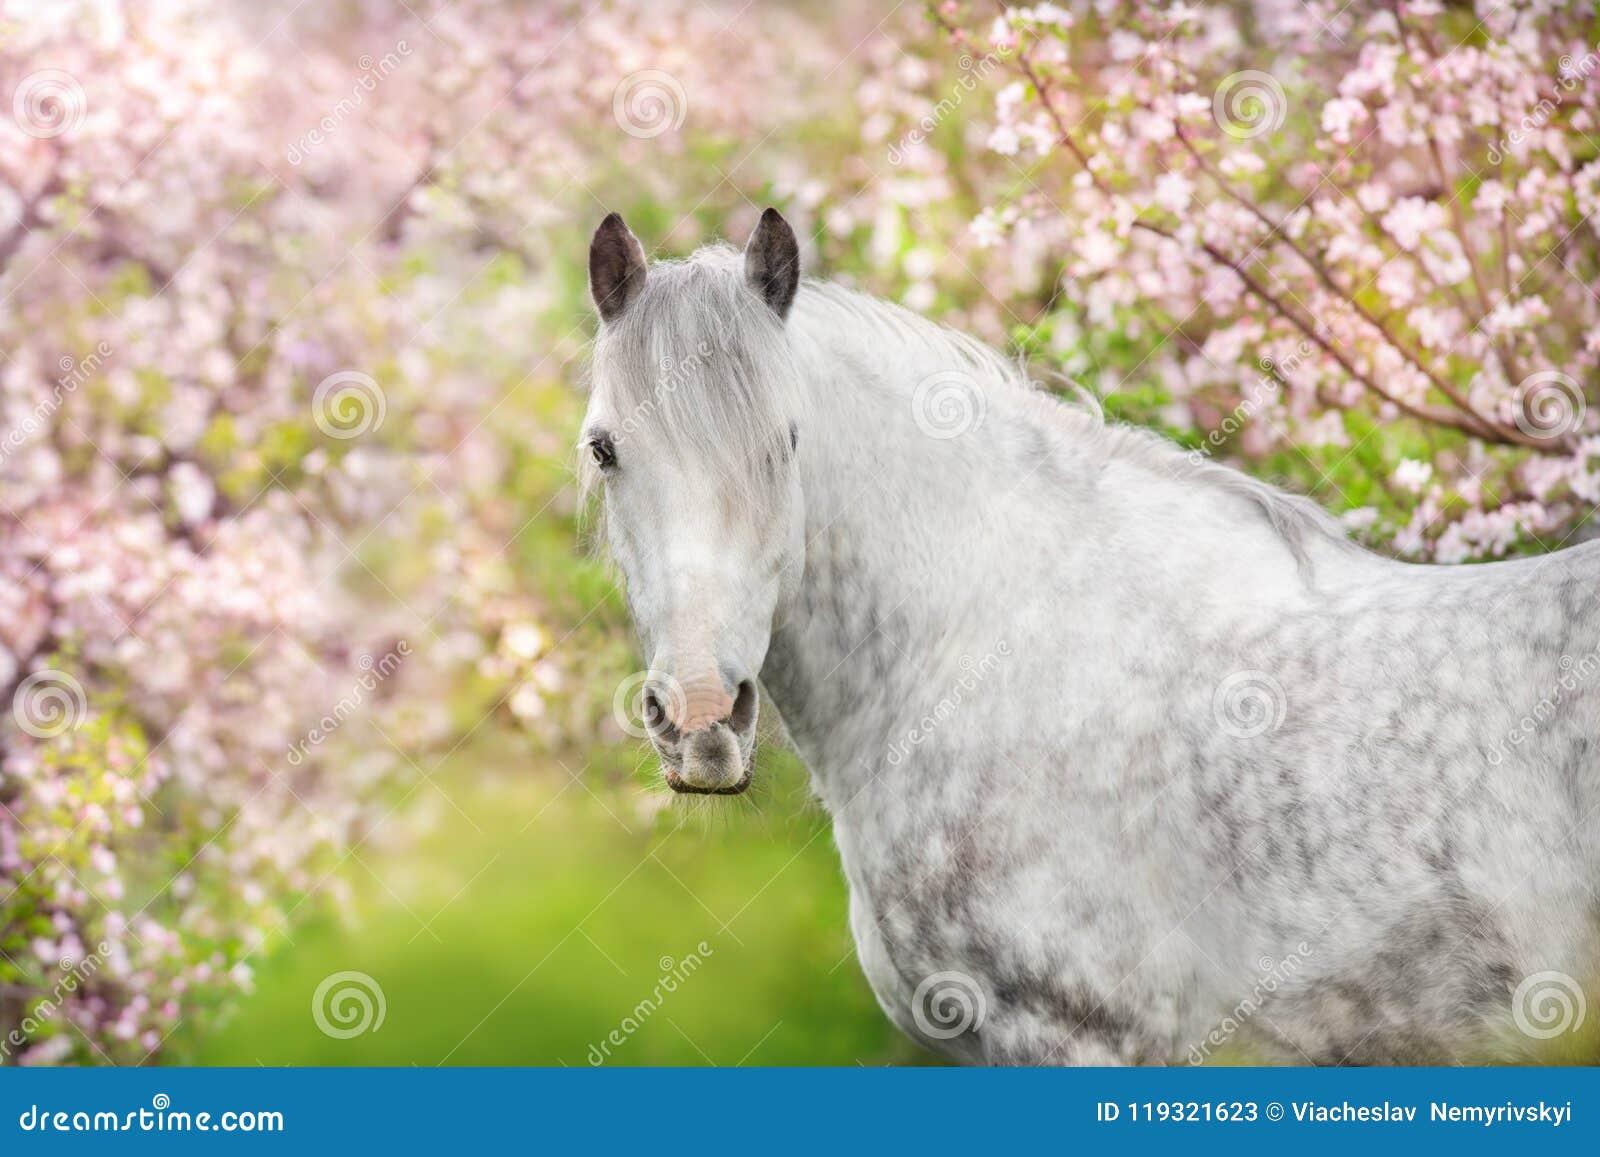 Wit paardportret in bloesem